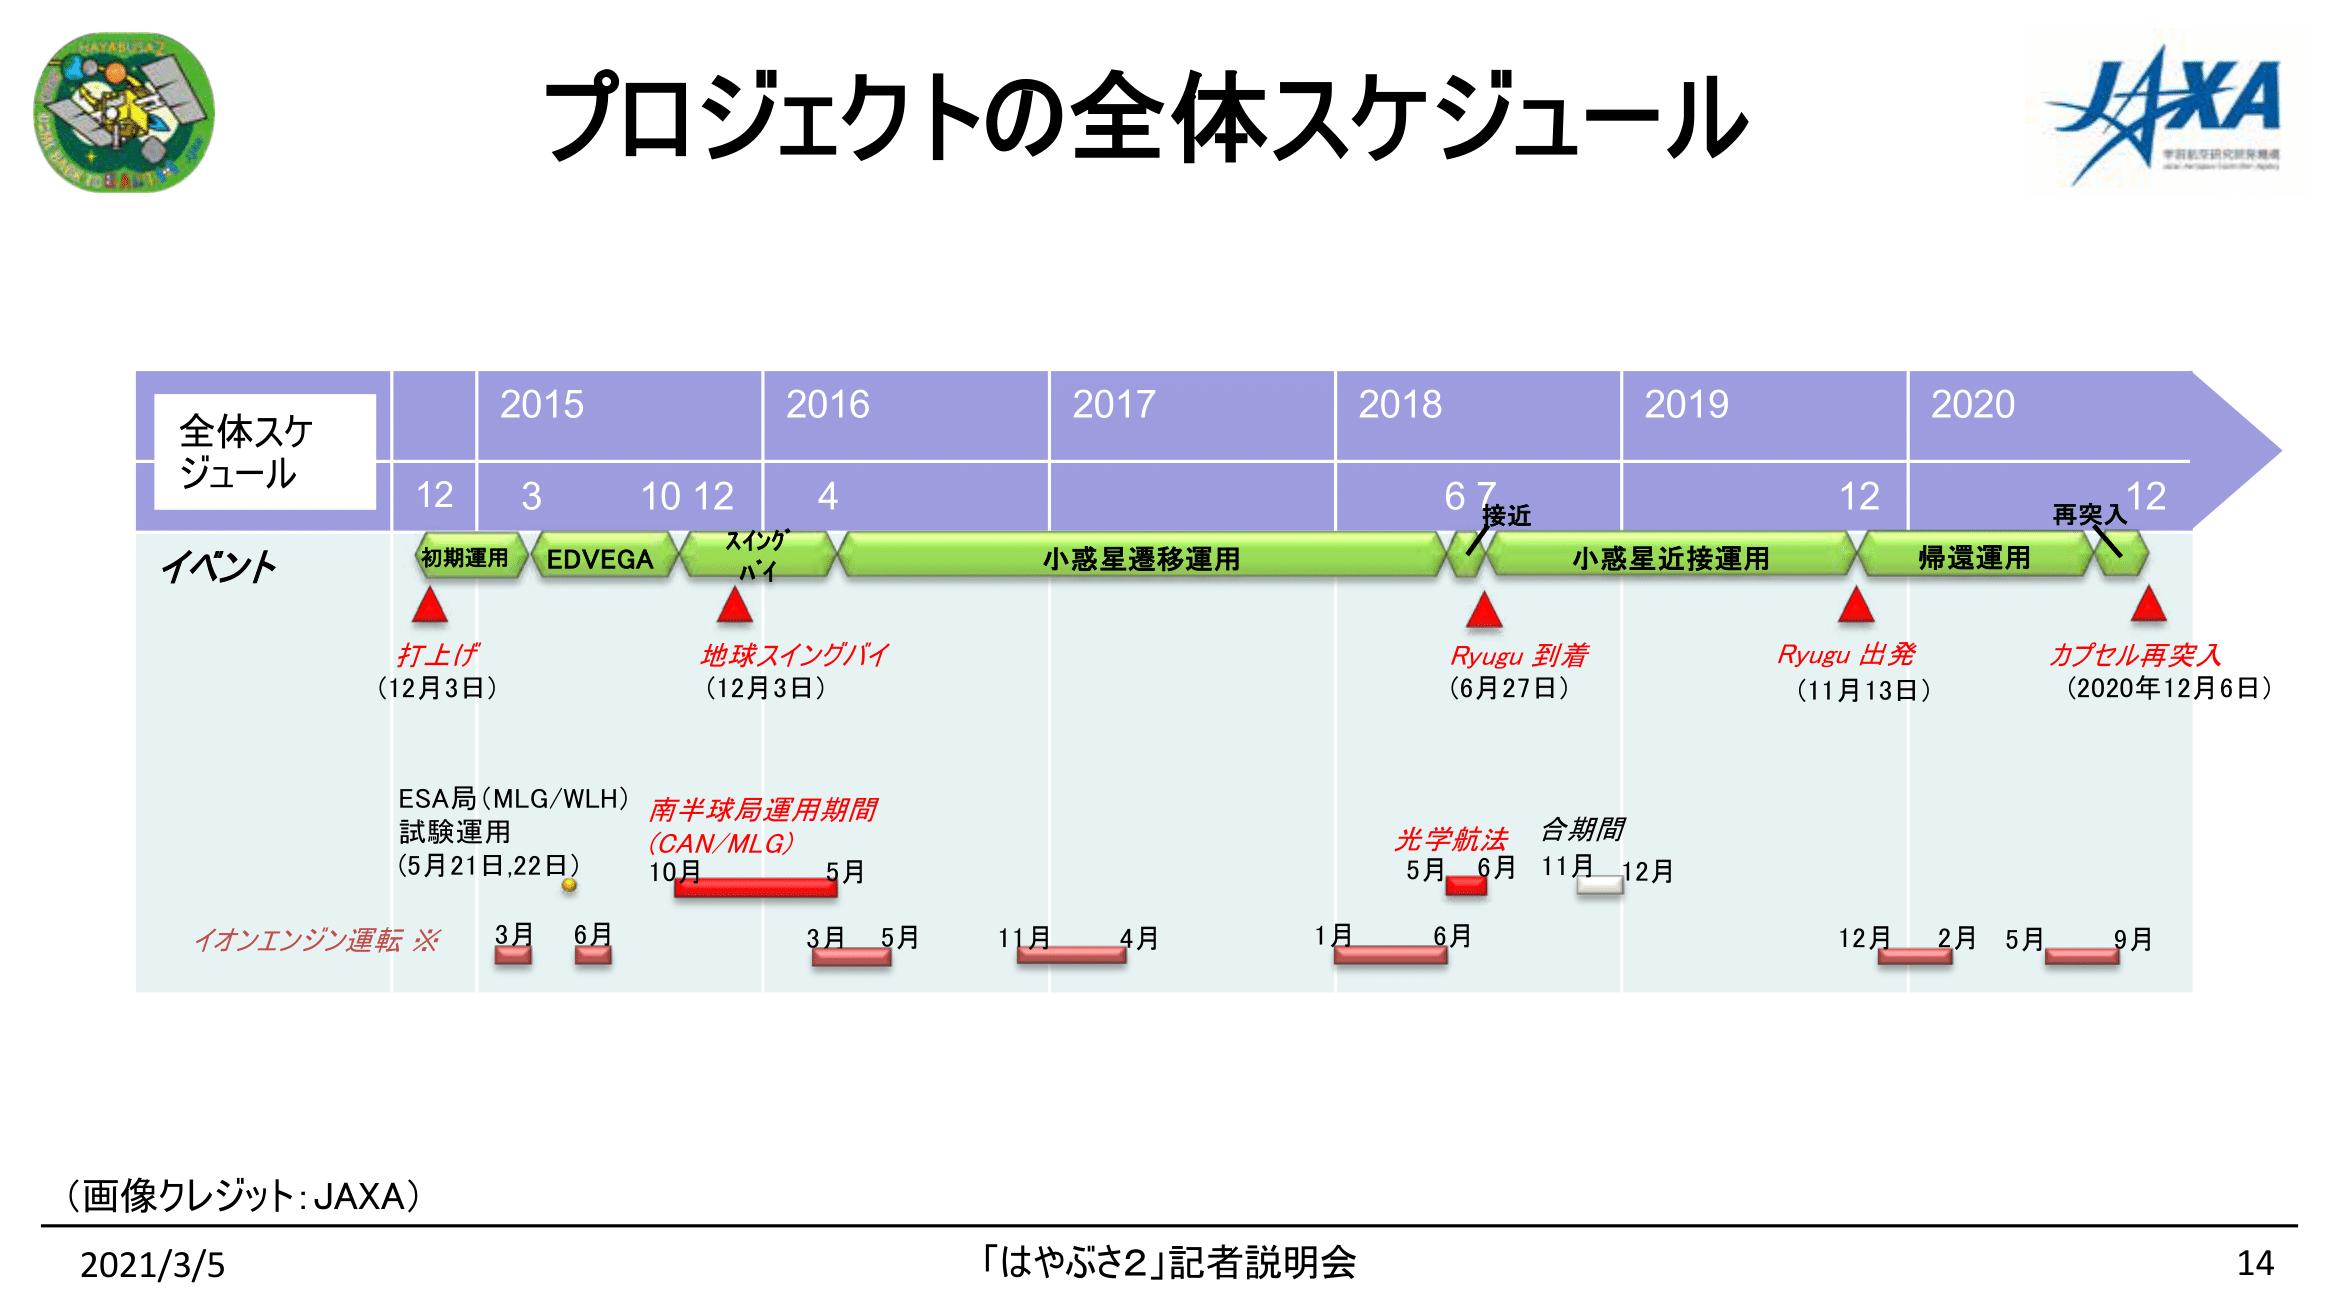 f:id:Imamura:20210305134231p:plain